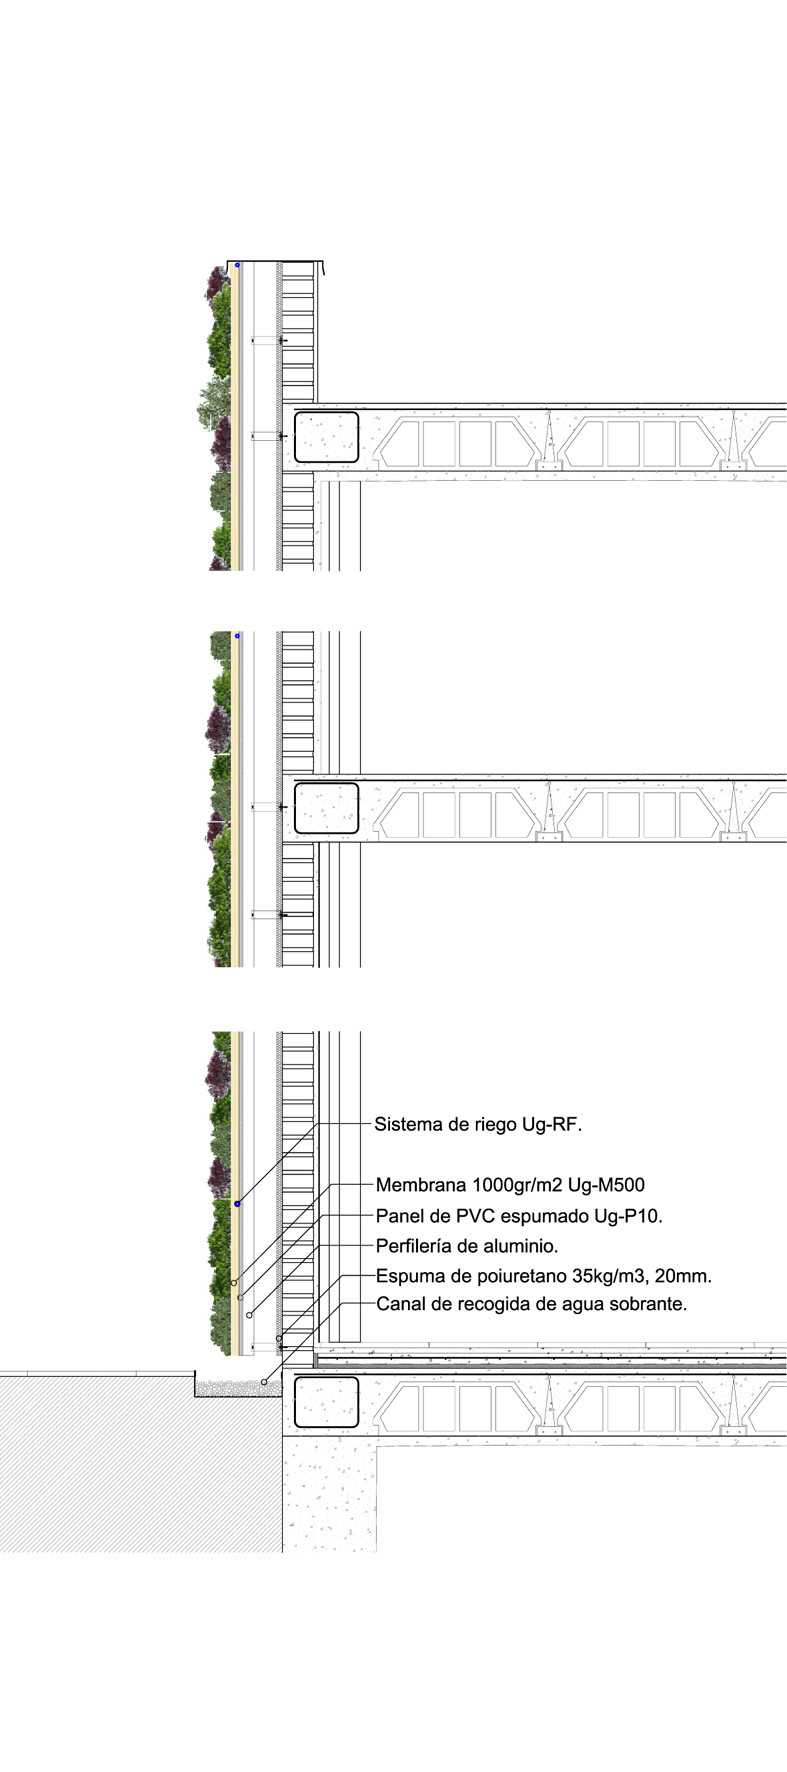 Galer a de en detalle jardines verticales 15 for Estructura para jardin vertical